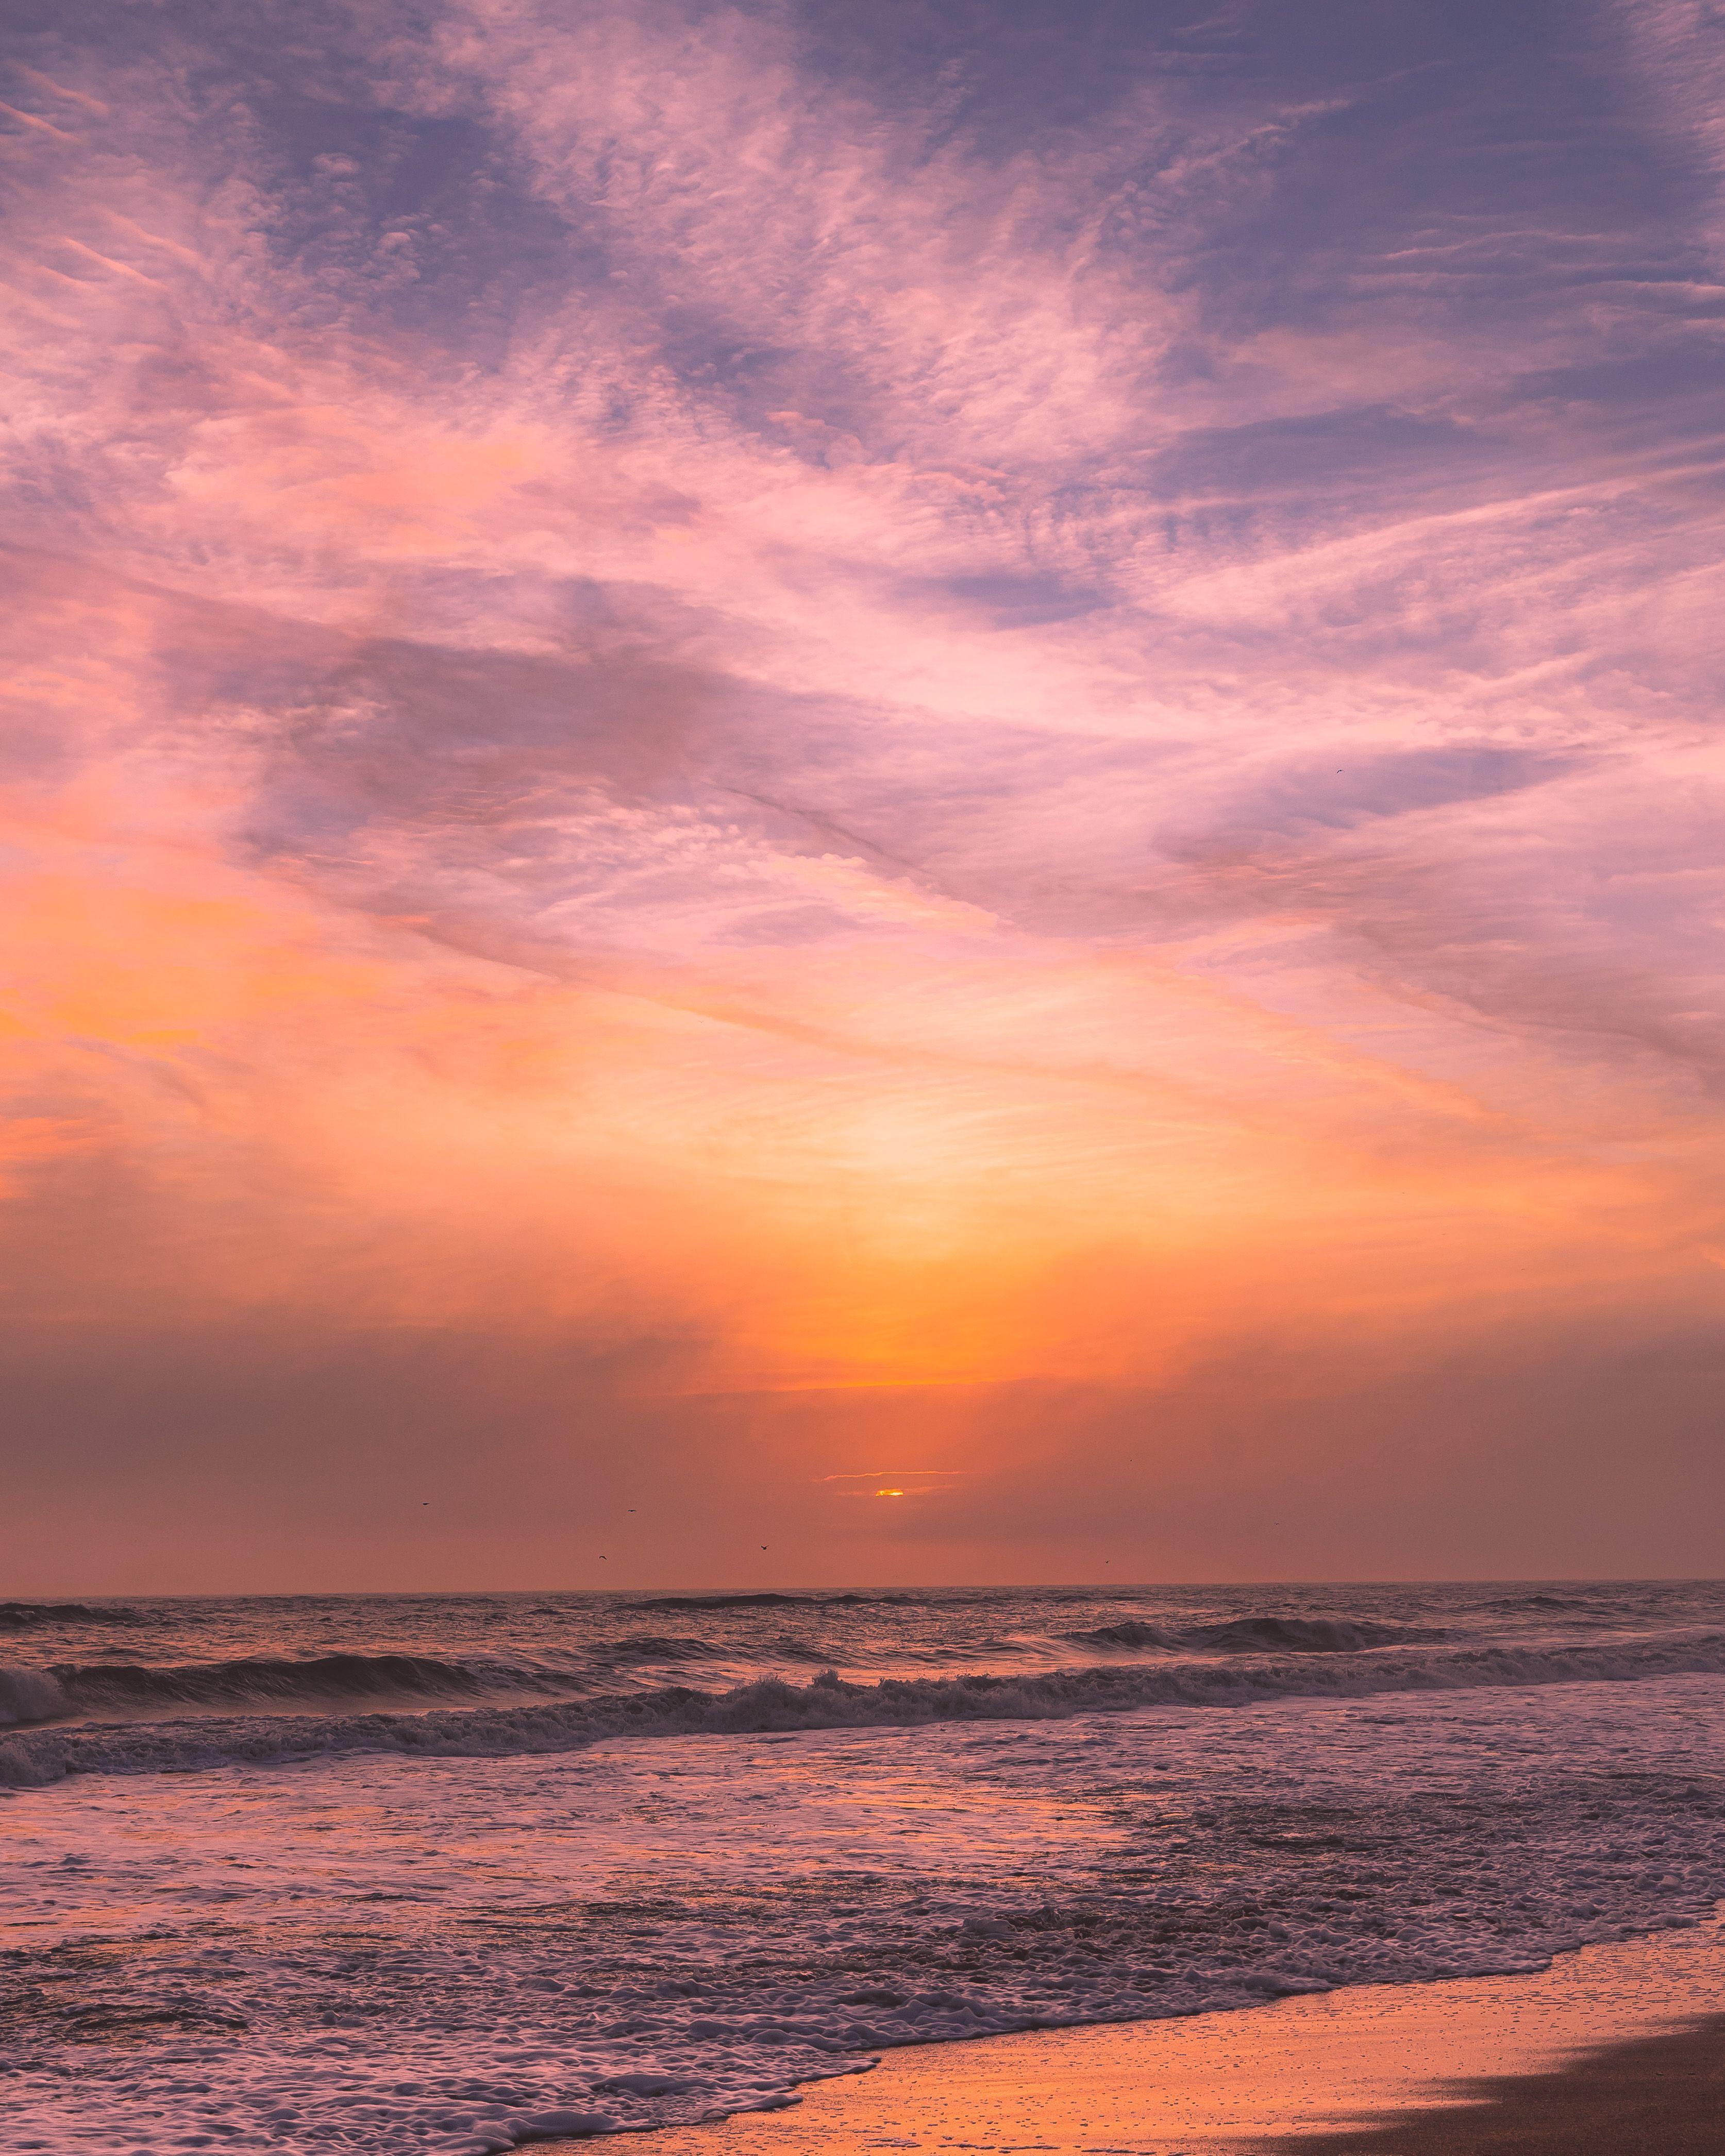 Beach pictures #homedecor #beachhousedecor #photography #landscape